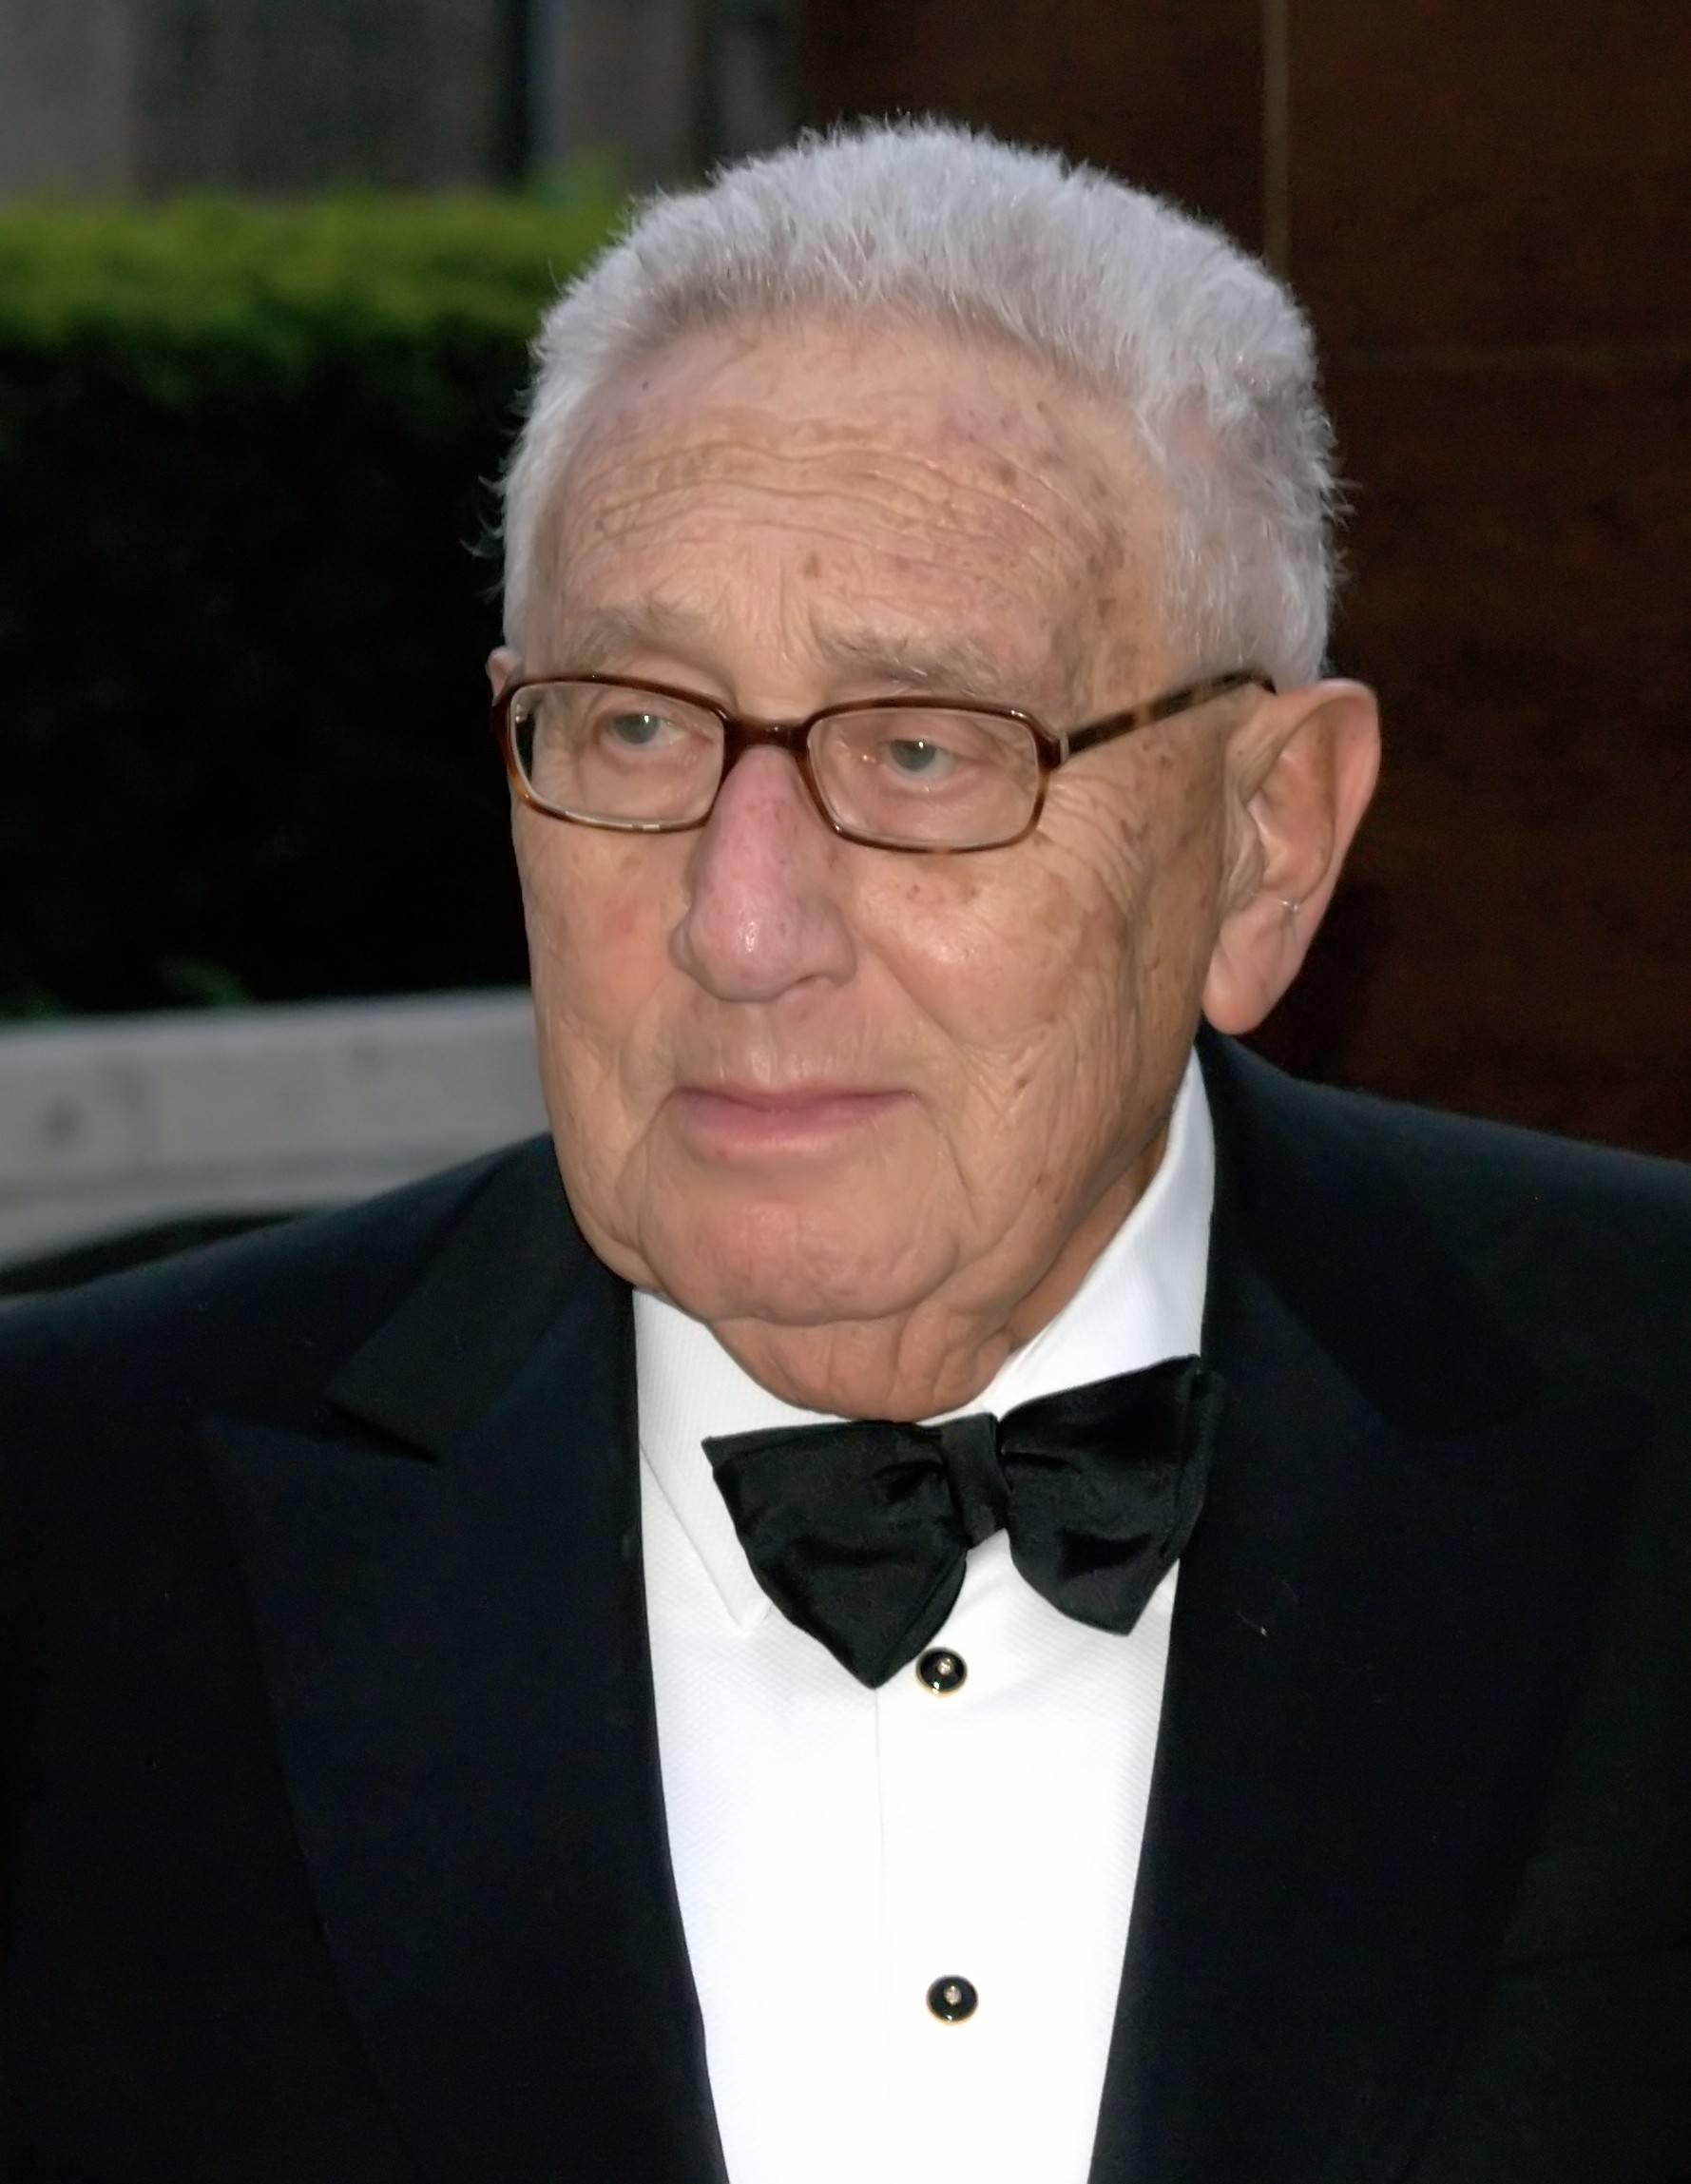 Henry Kissinger. Quelle: Wikipedia, Photo: Shankbone, gemeinfrei, cc-by-3.0